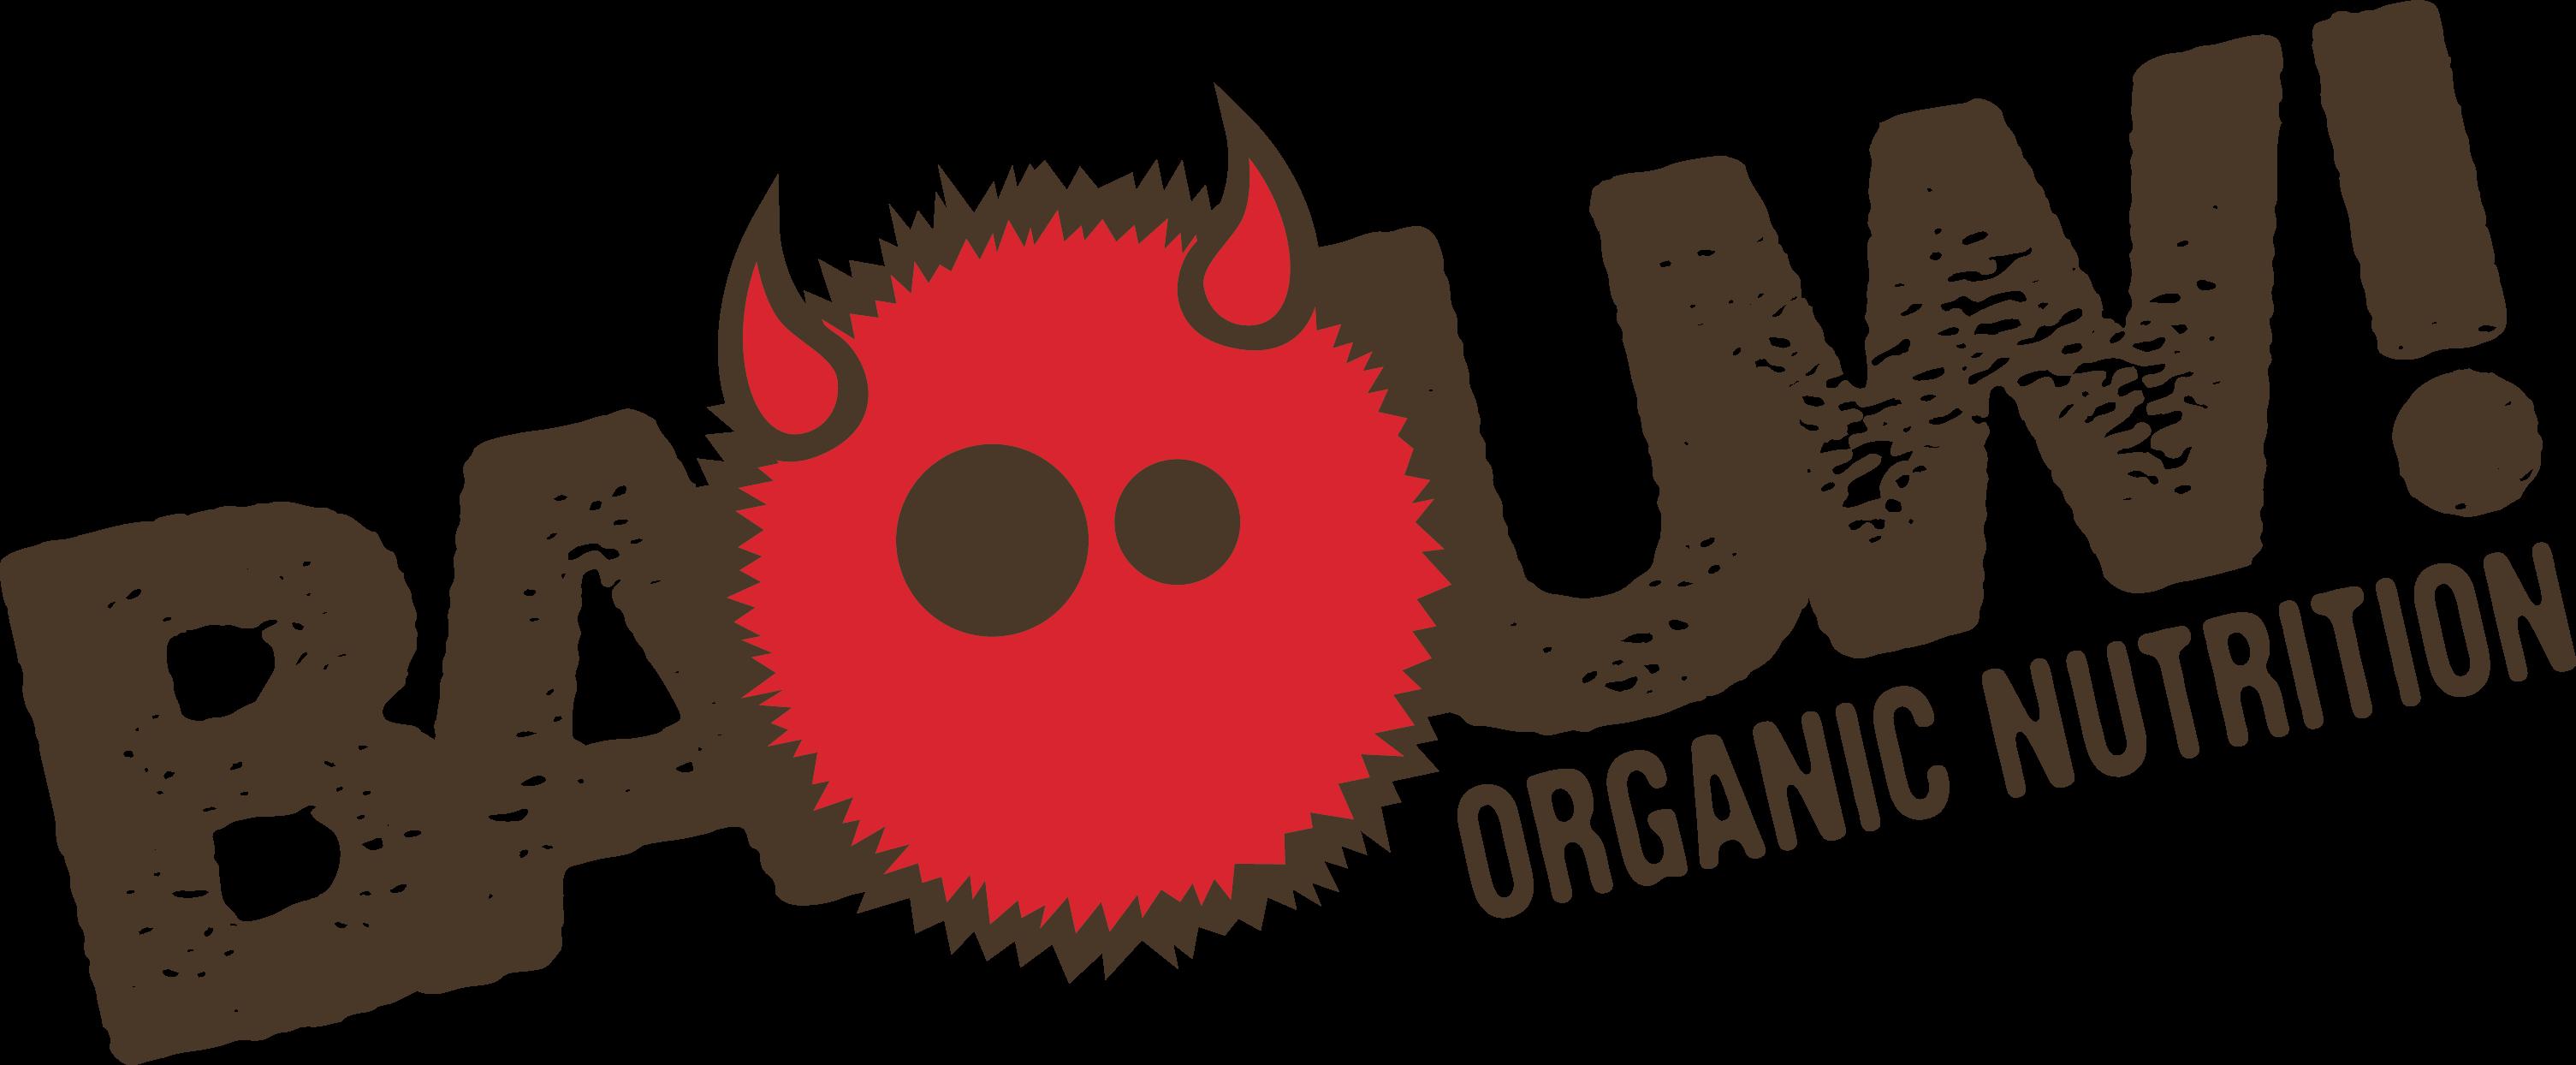 BAOUW Organic Nutrition